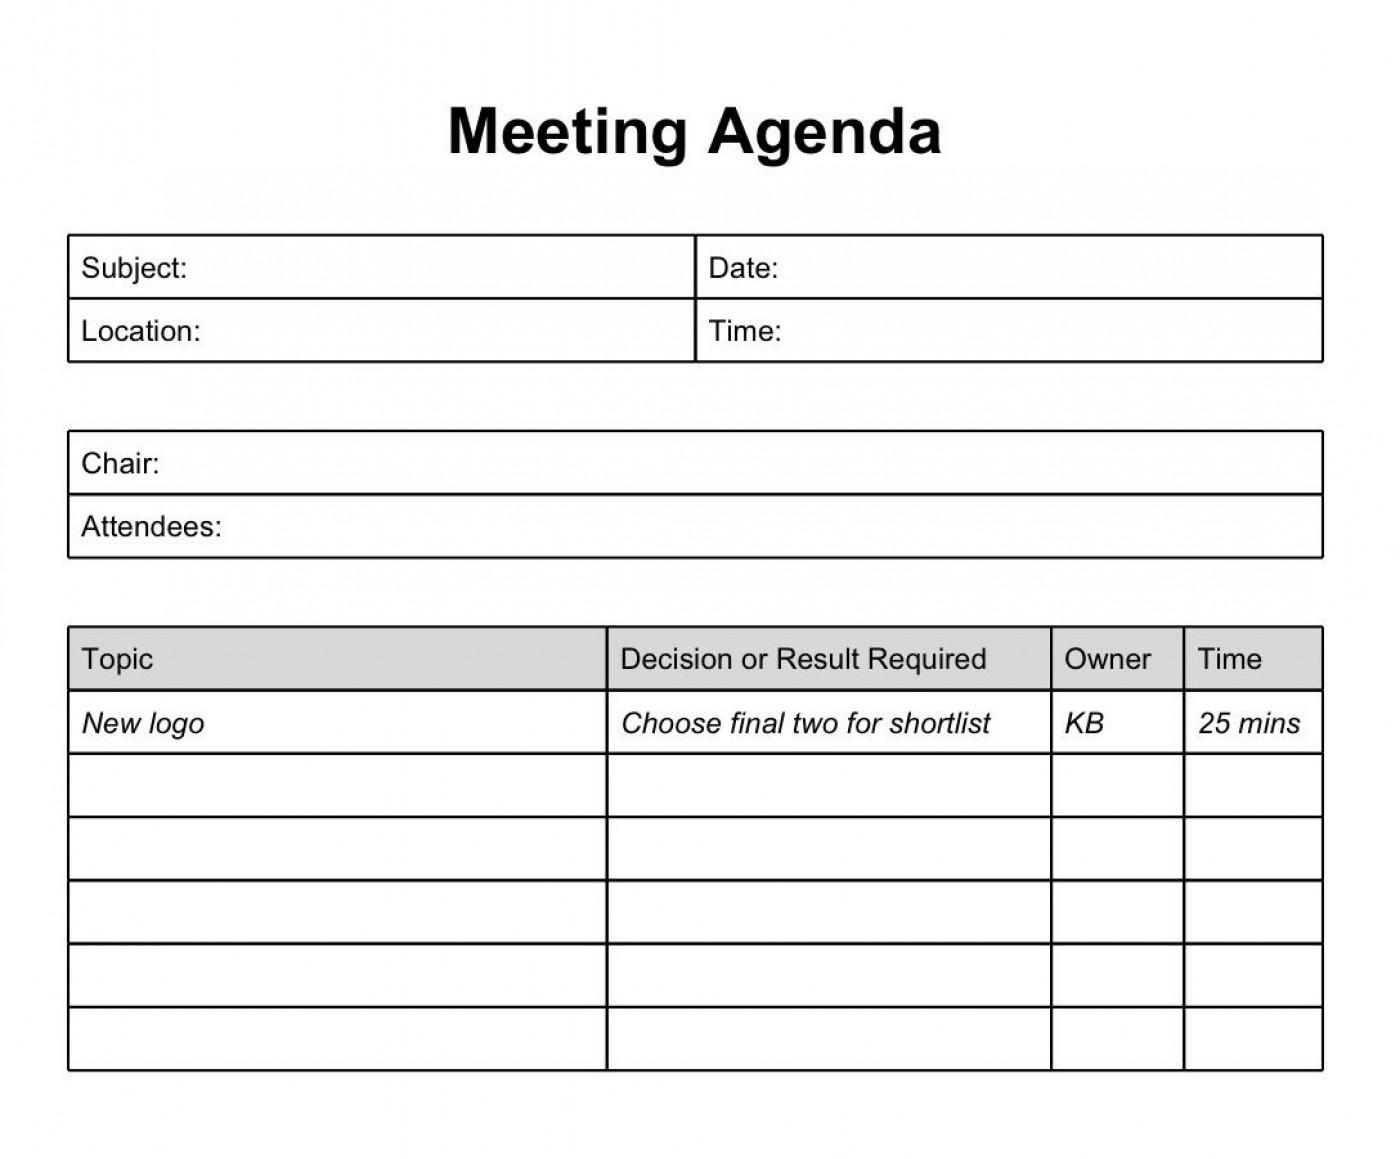 003 Shocking Meeting Agenda Template Word Example  Microsoft Board 20101400